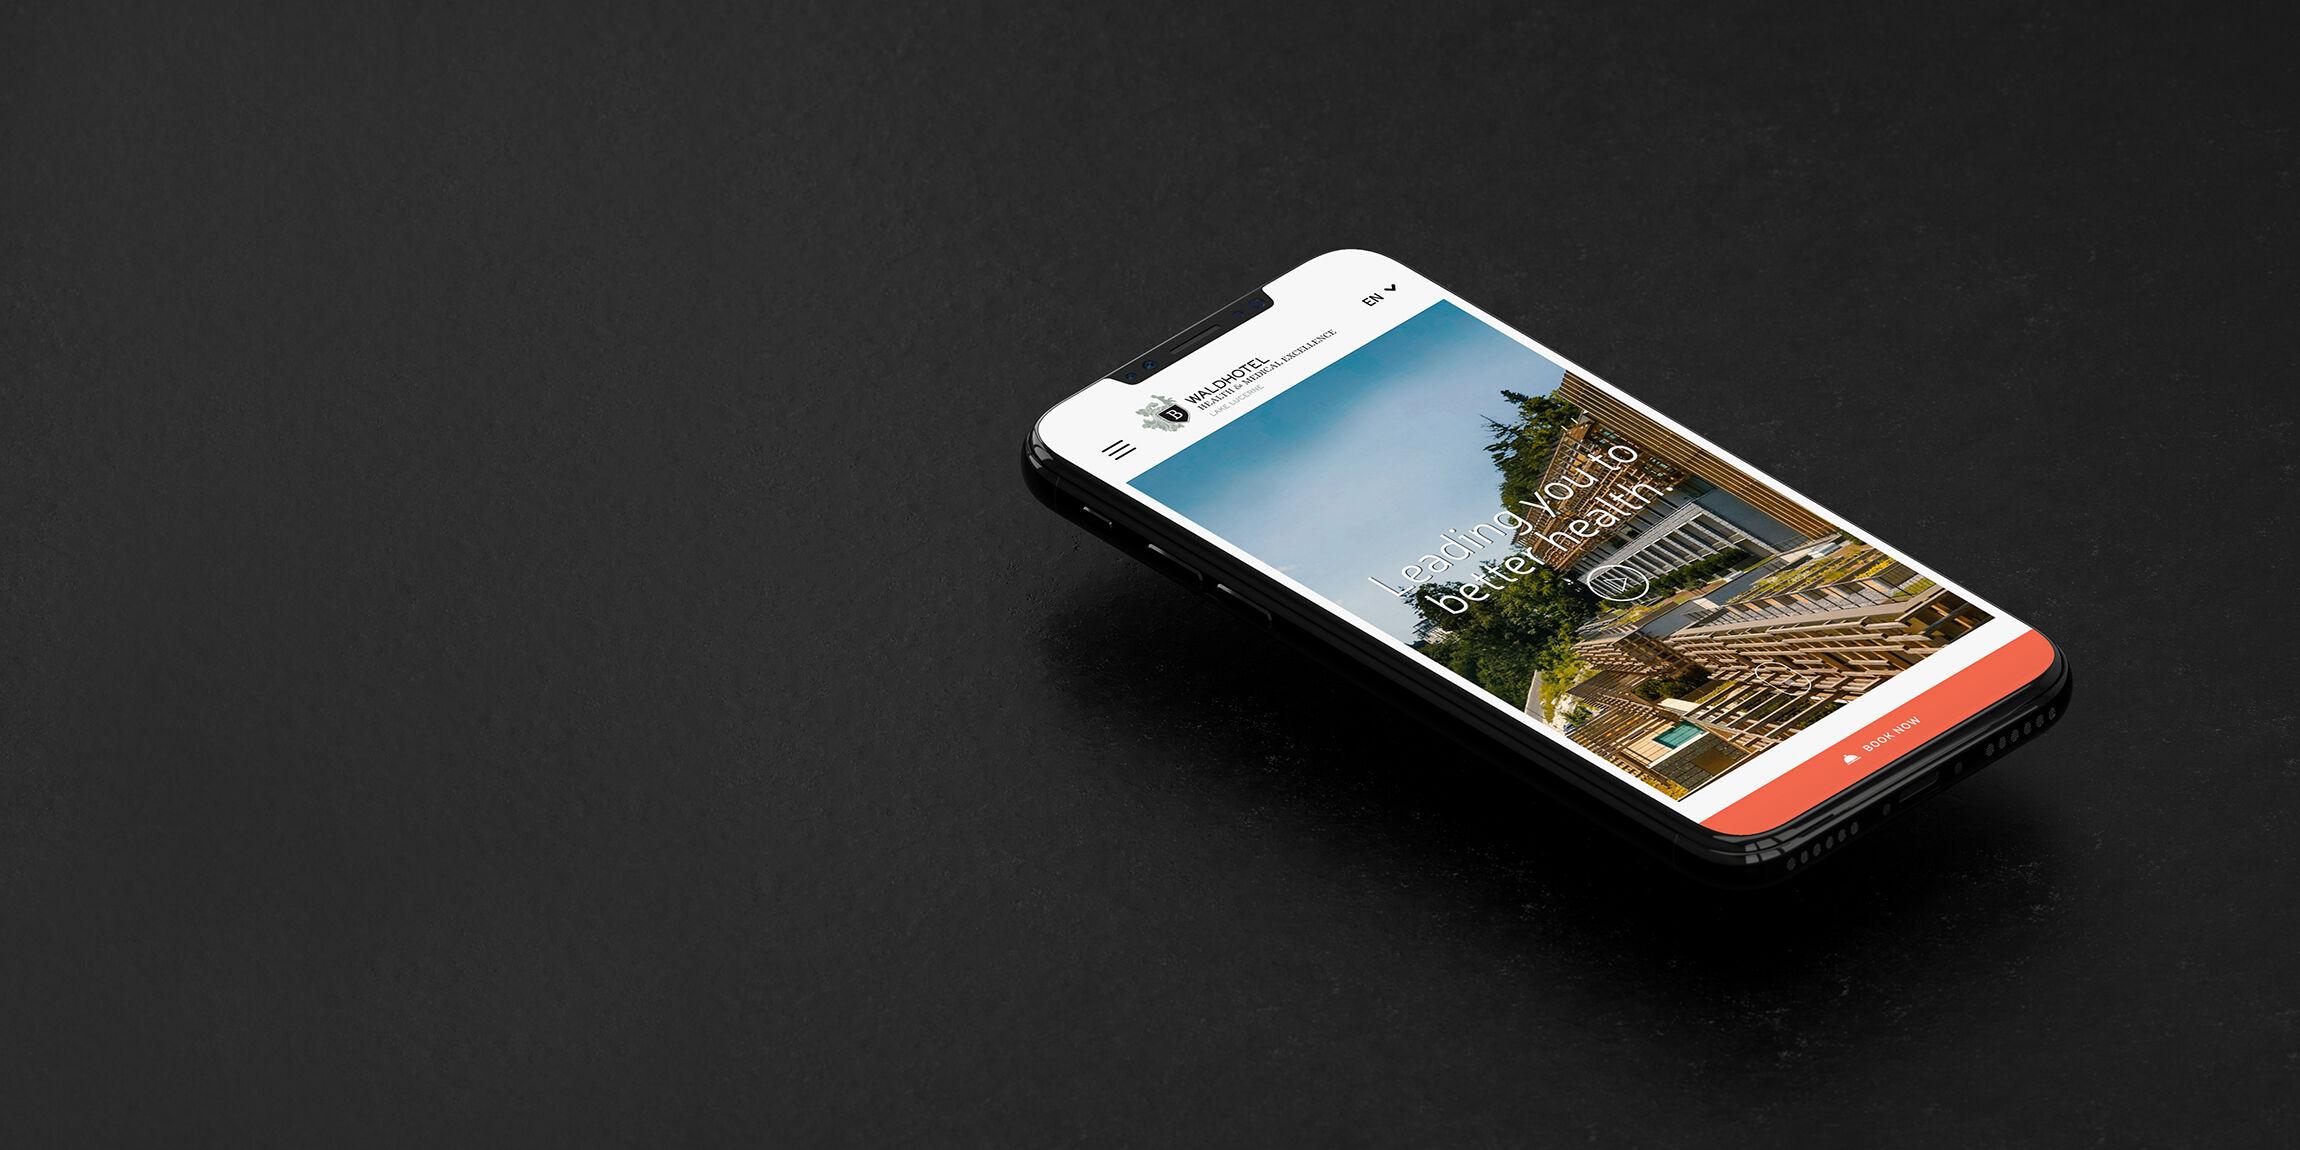 Bürgenstock Waldhotel: Design, User Experience & Usability